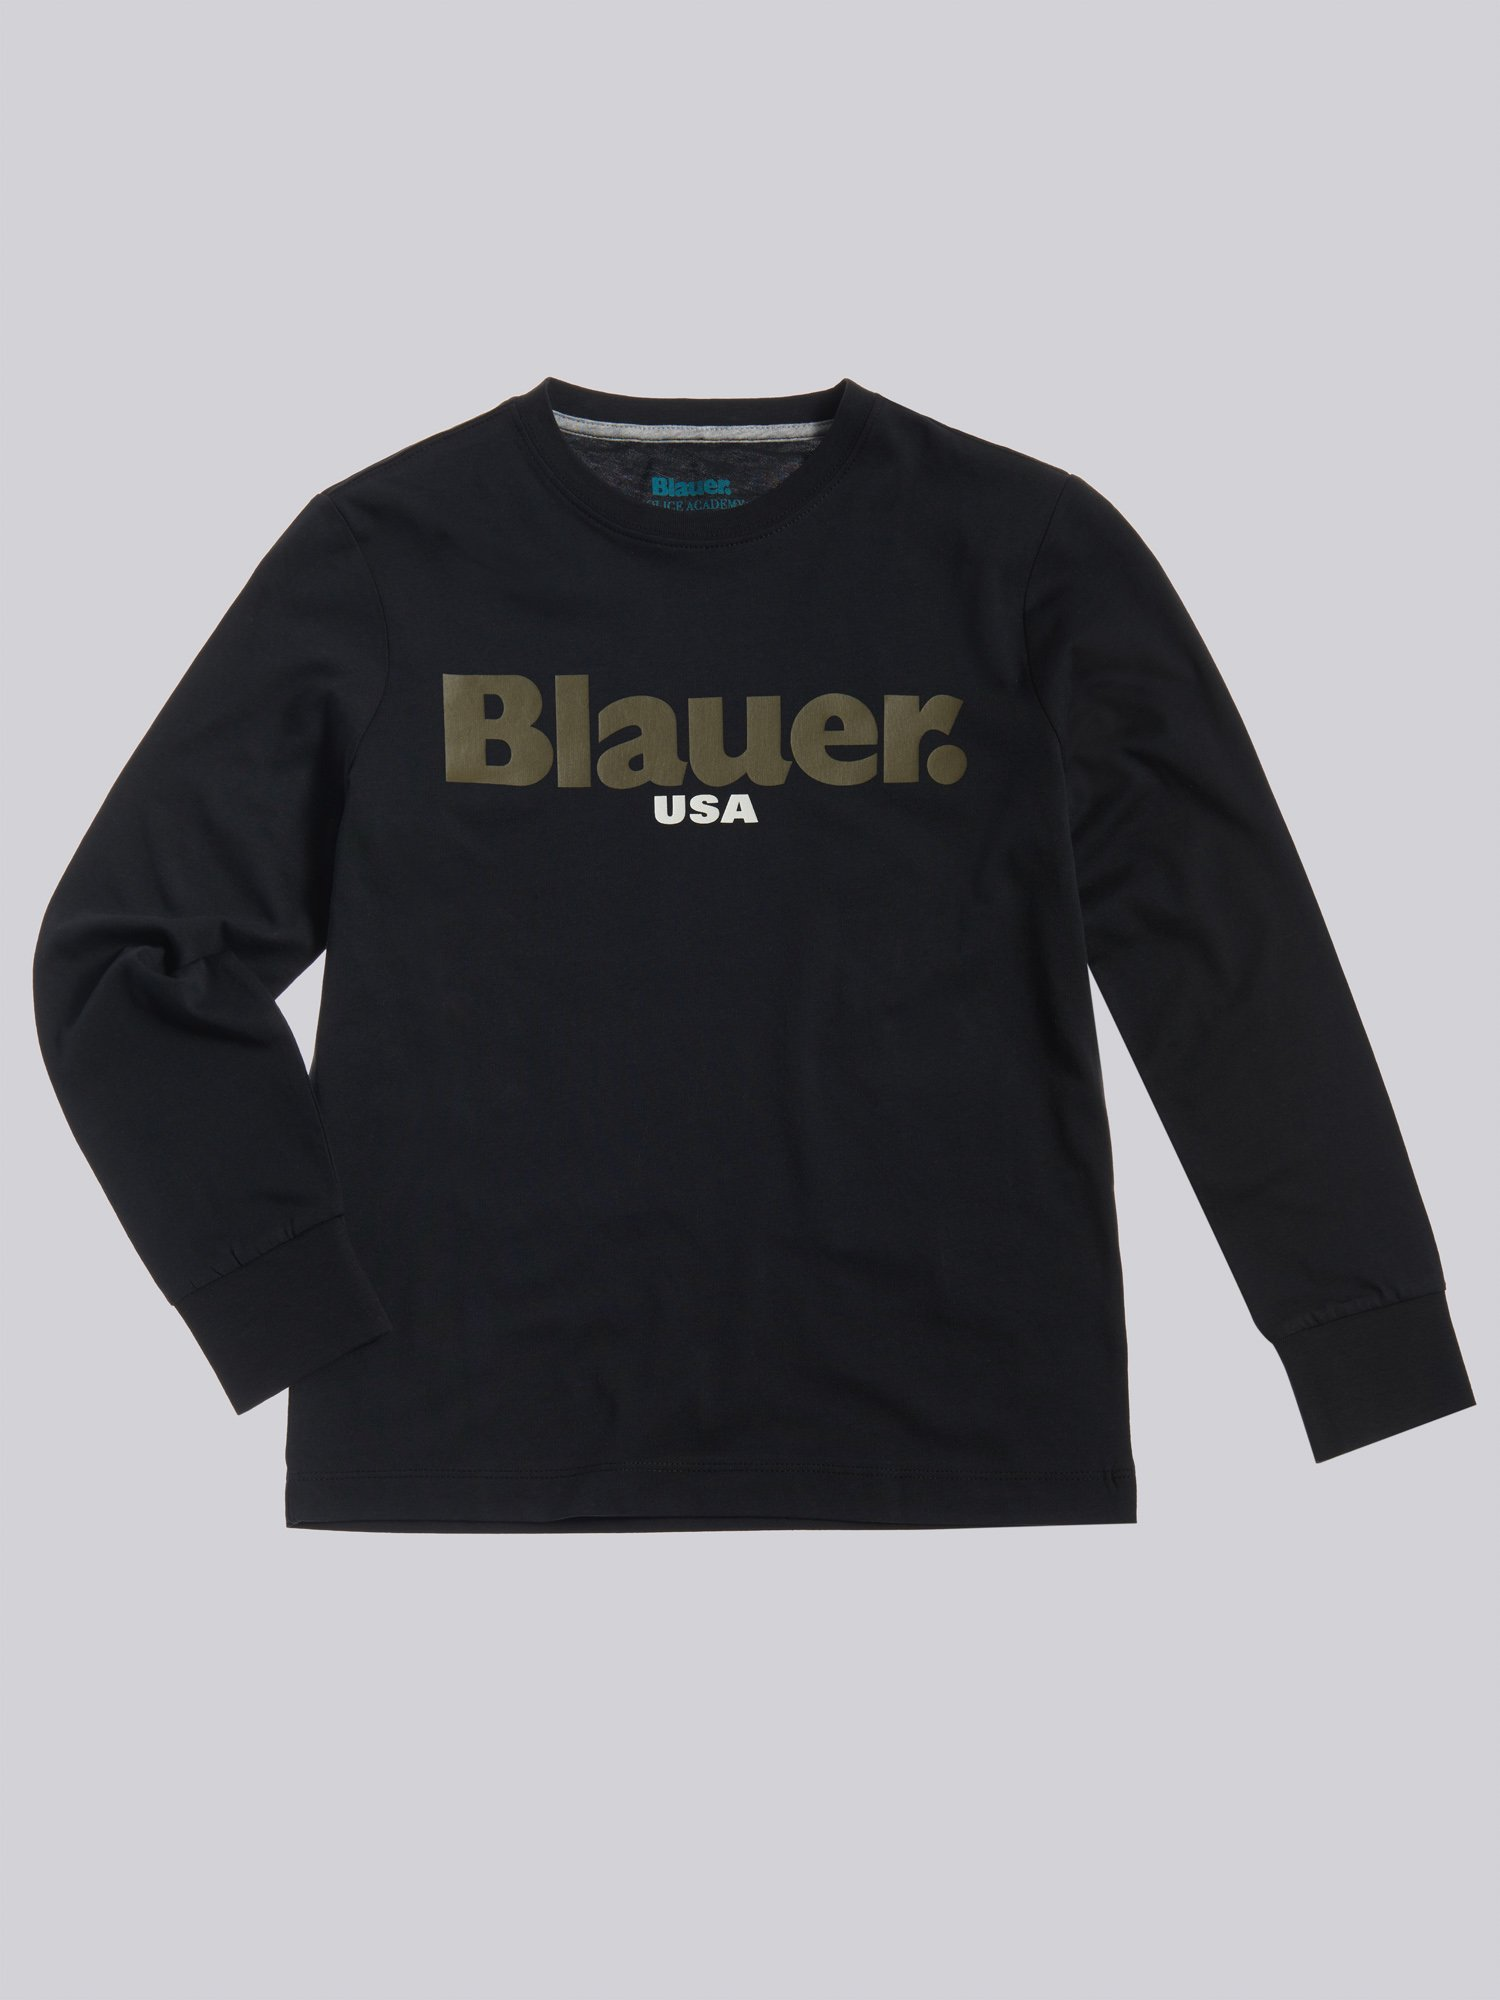 Blauer - T-SHIRT MANCHE LONGUE BLAUER - Noir - Blauer